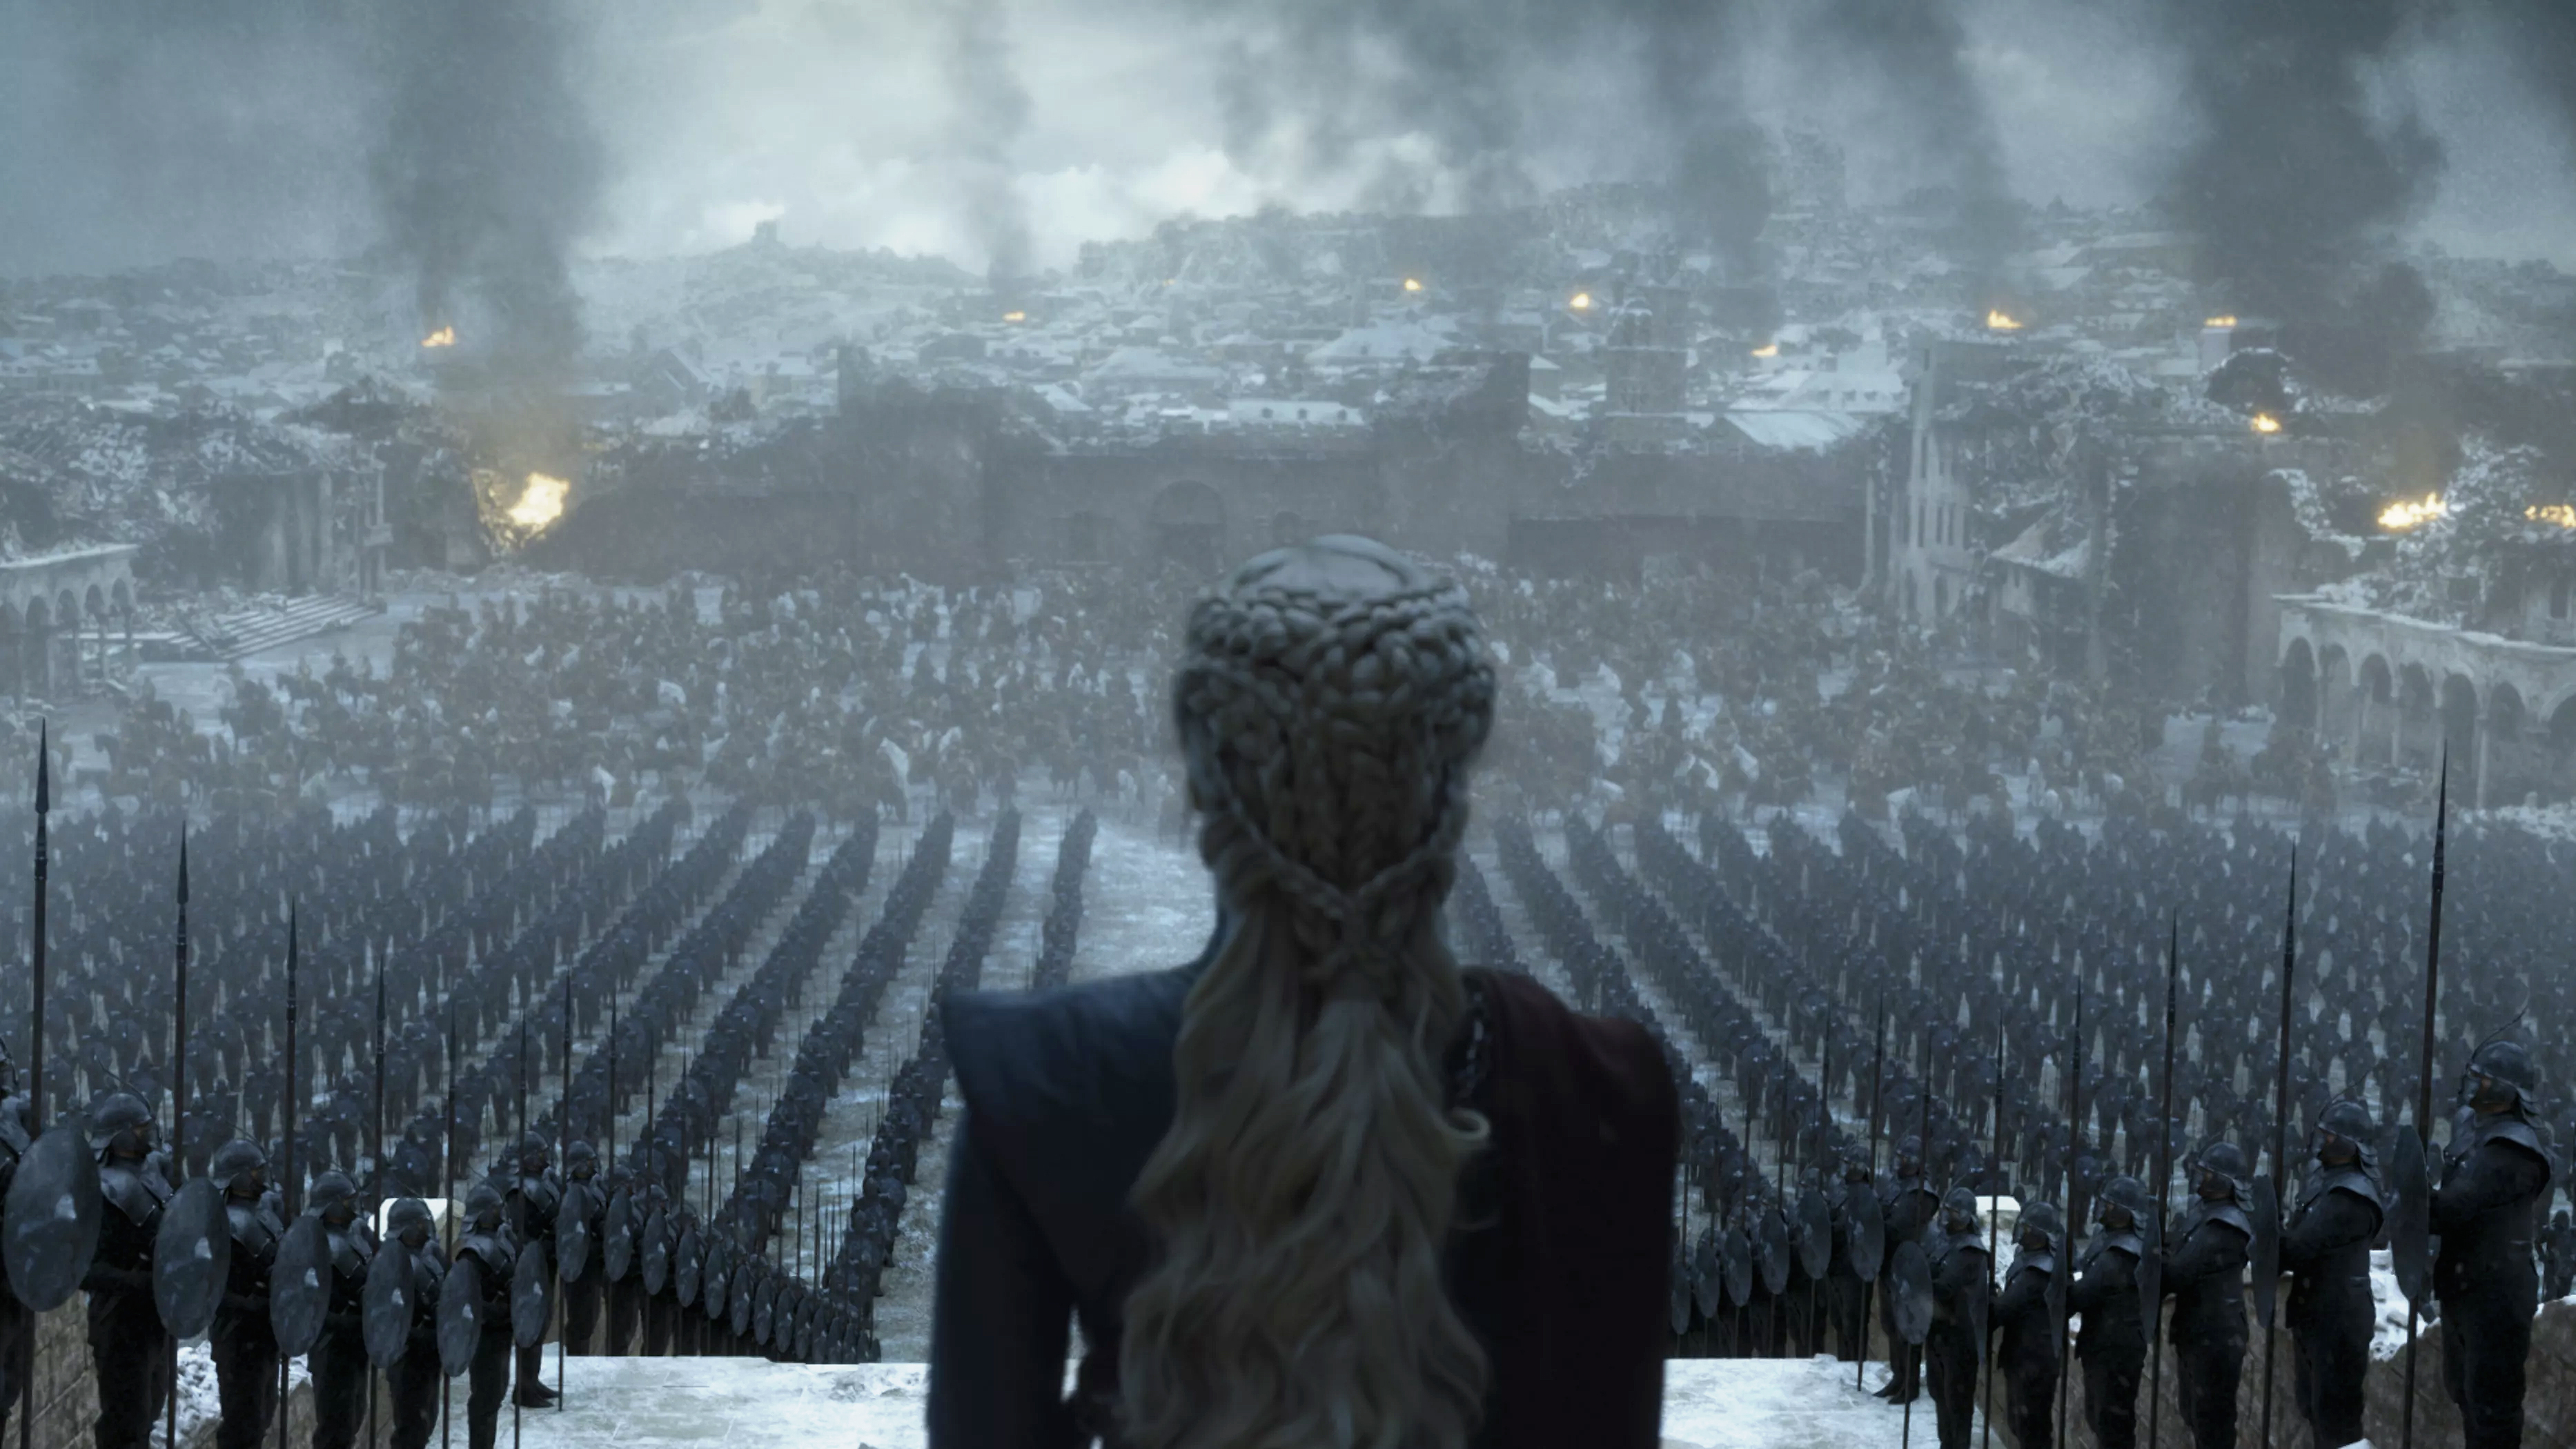 8x06 - The Iron सिंहासन - Daenerys